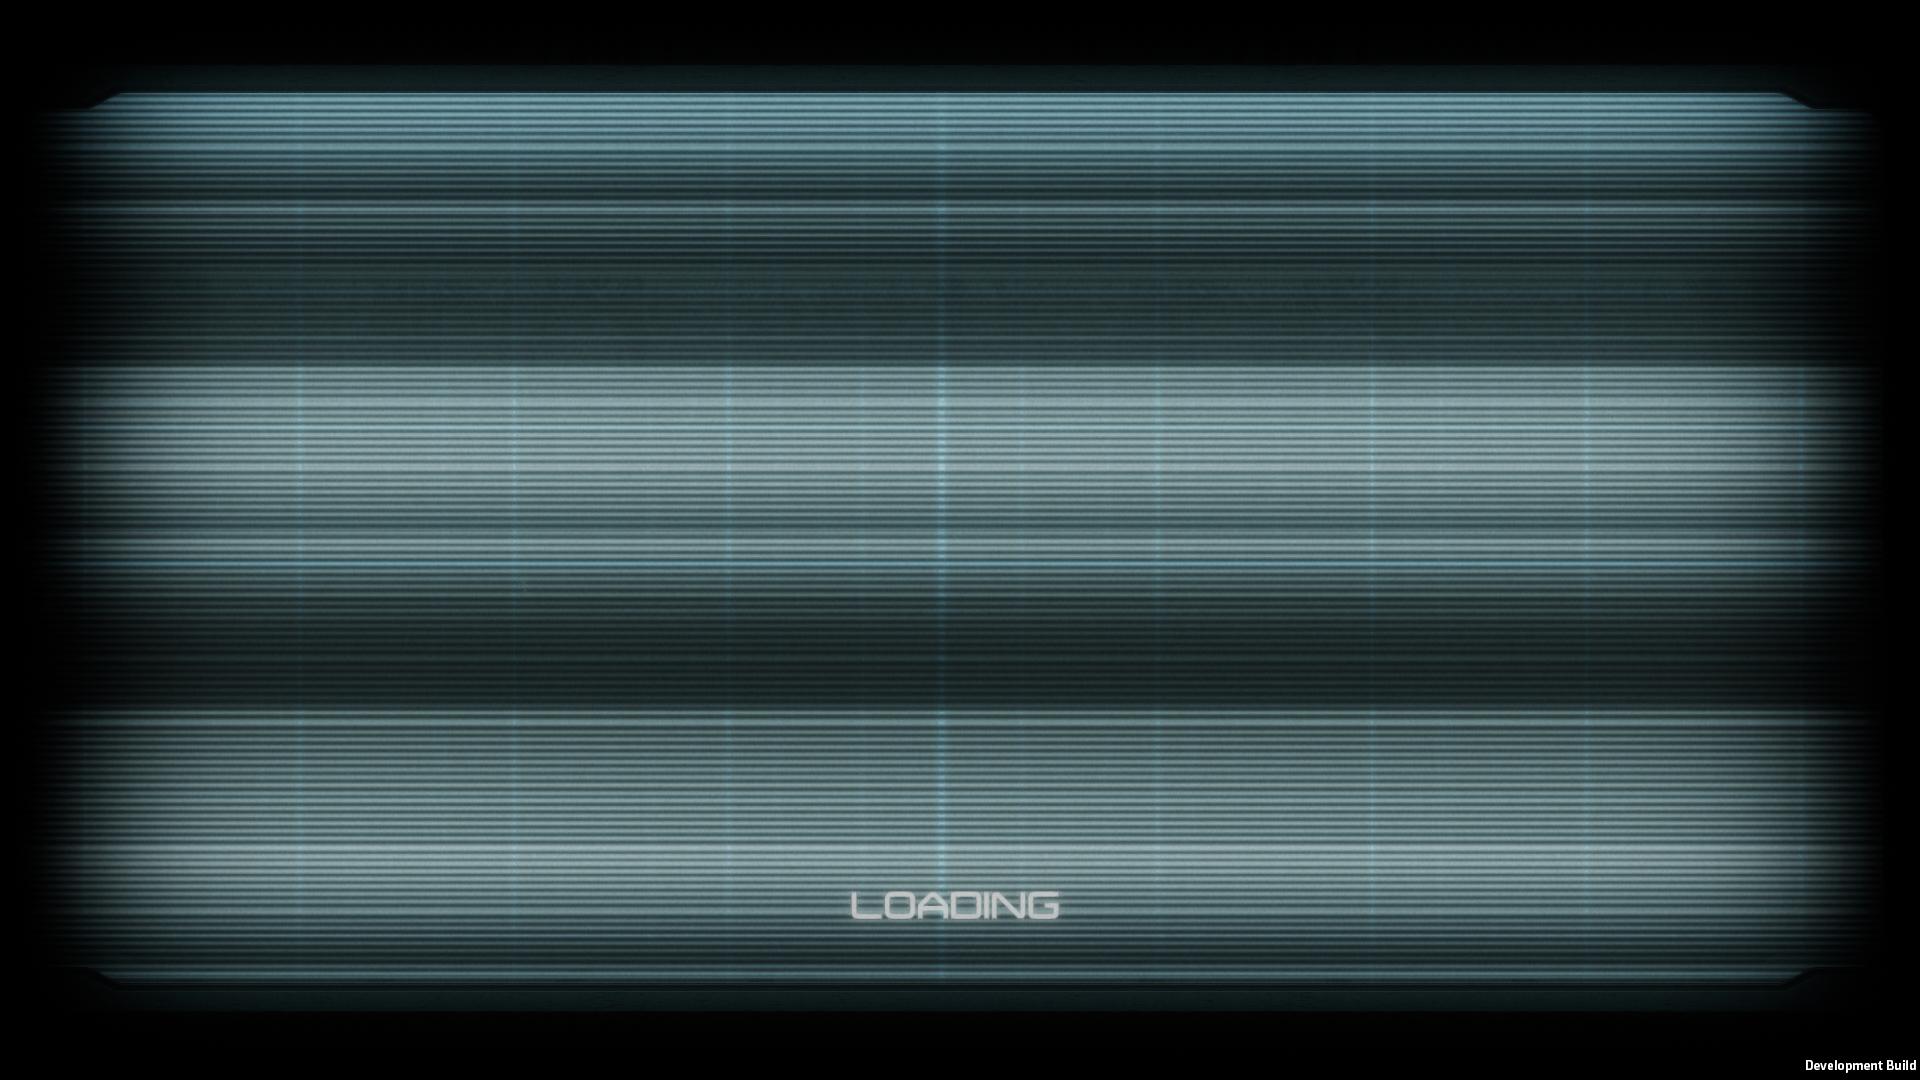 A screenshot of the loading screen